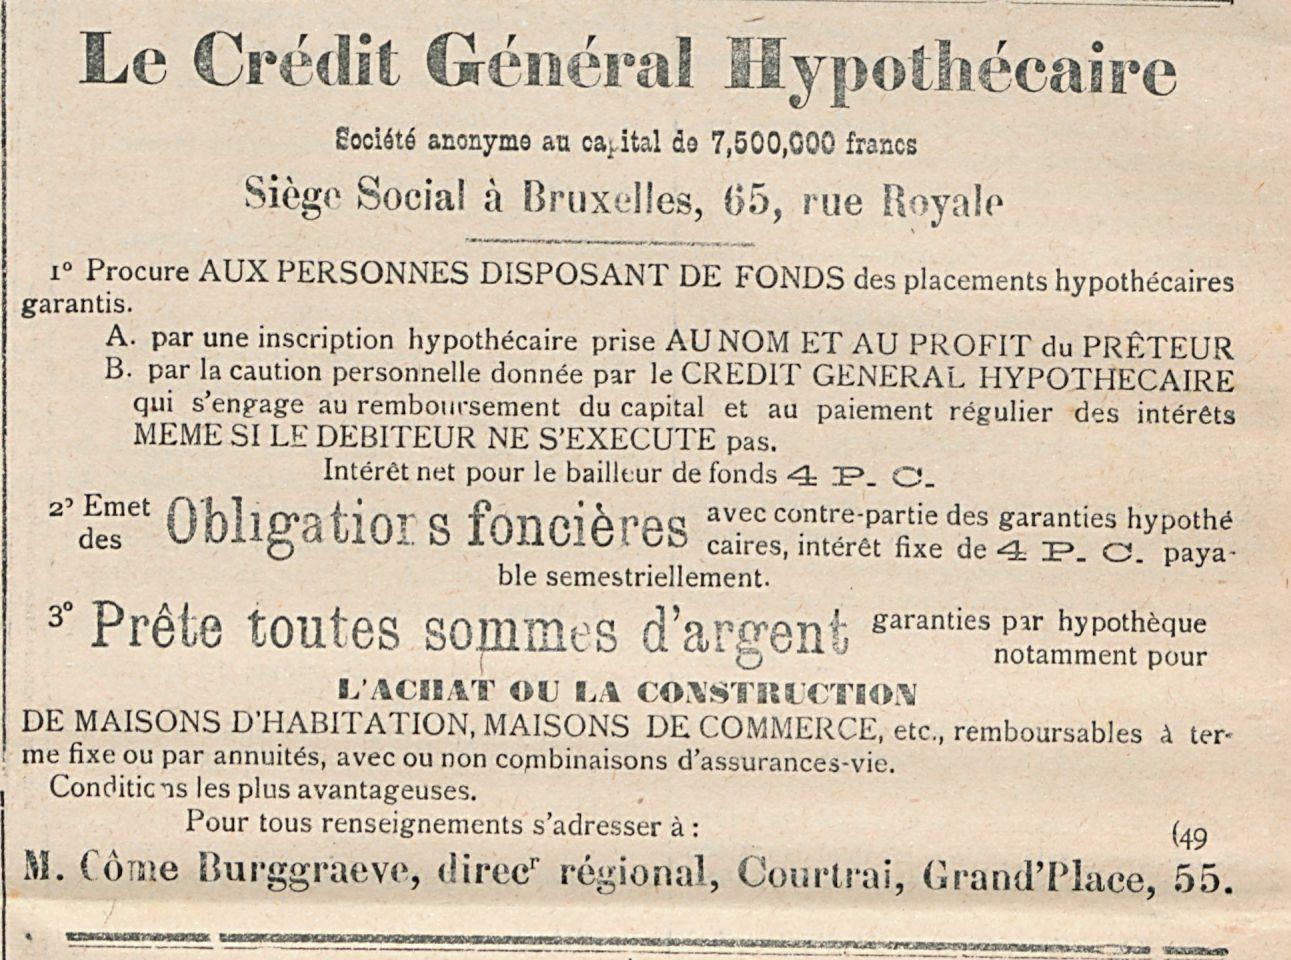 Le Credit General Hypothecaire